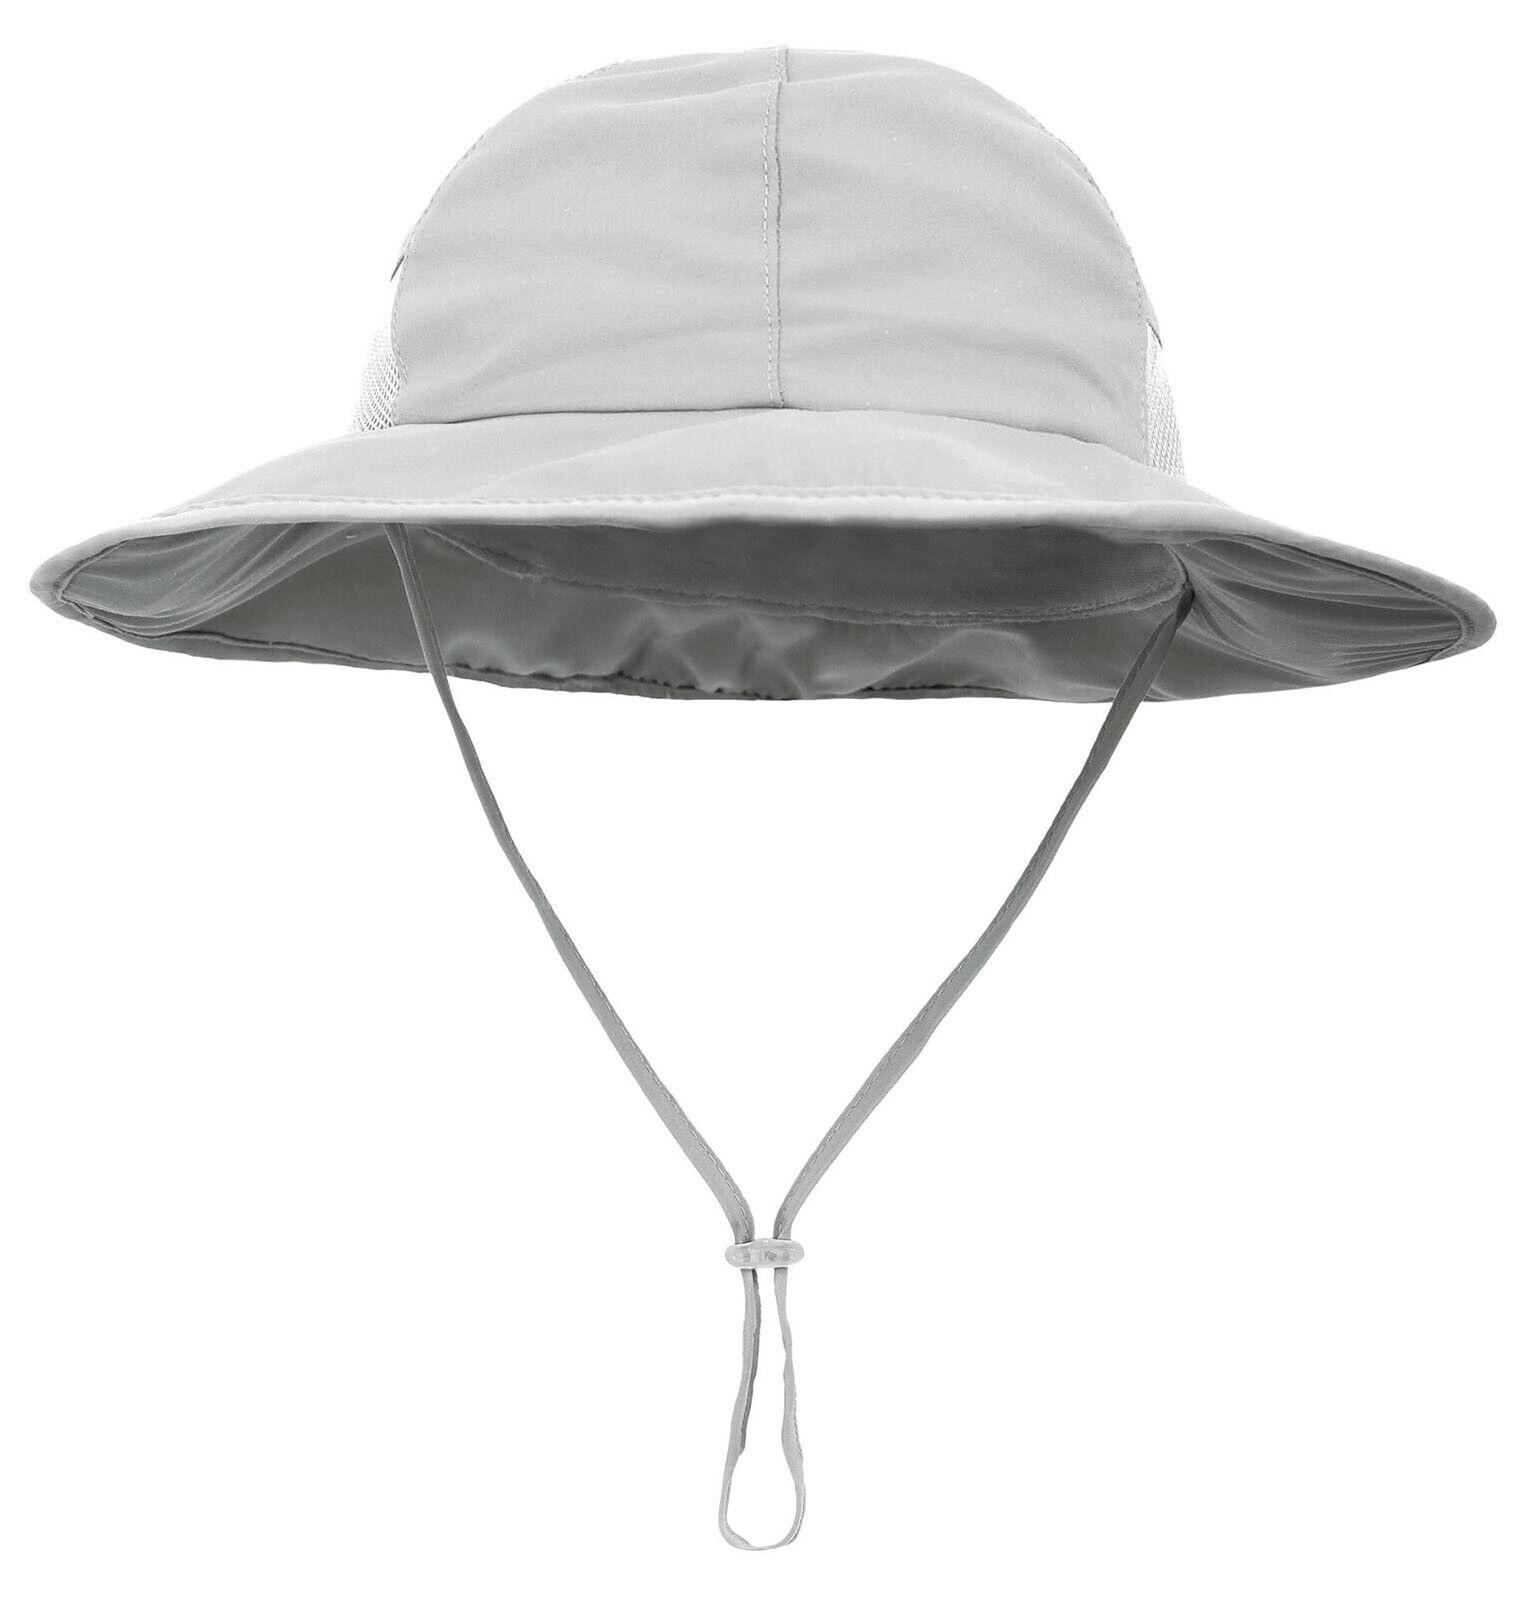 Toddler Infant Baby Girl Boys Outdoor Bucket Hat Summer Wide